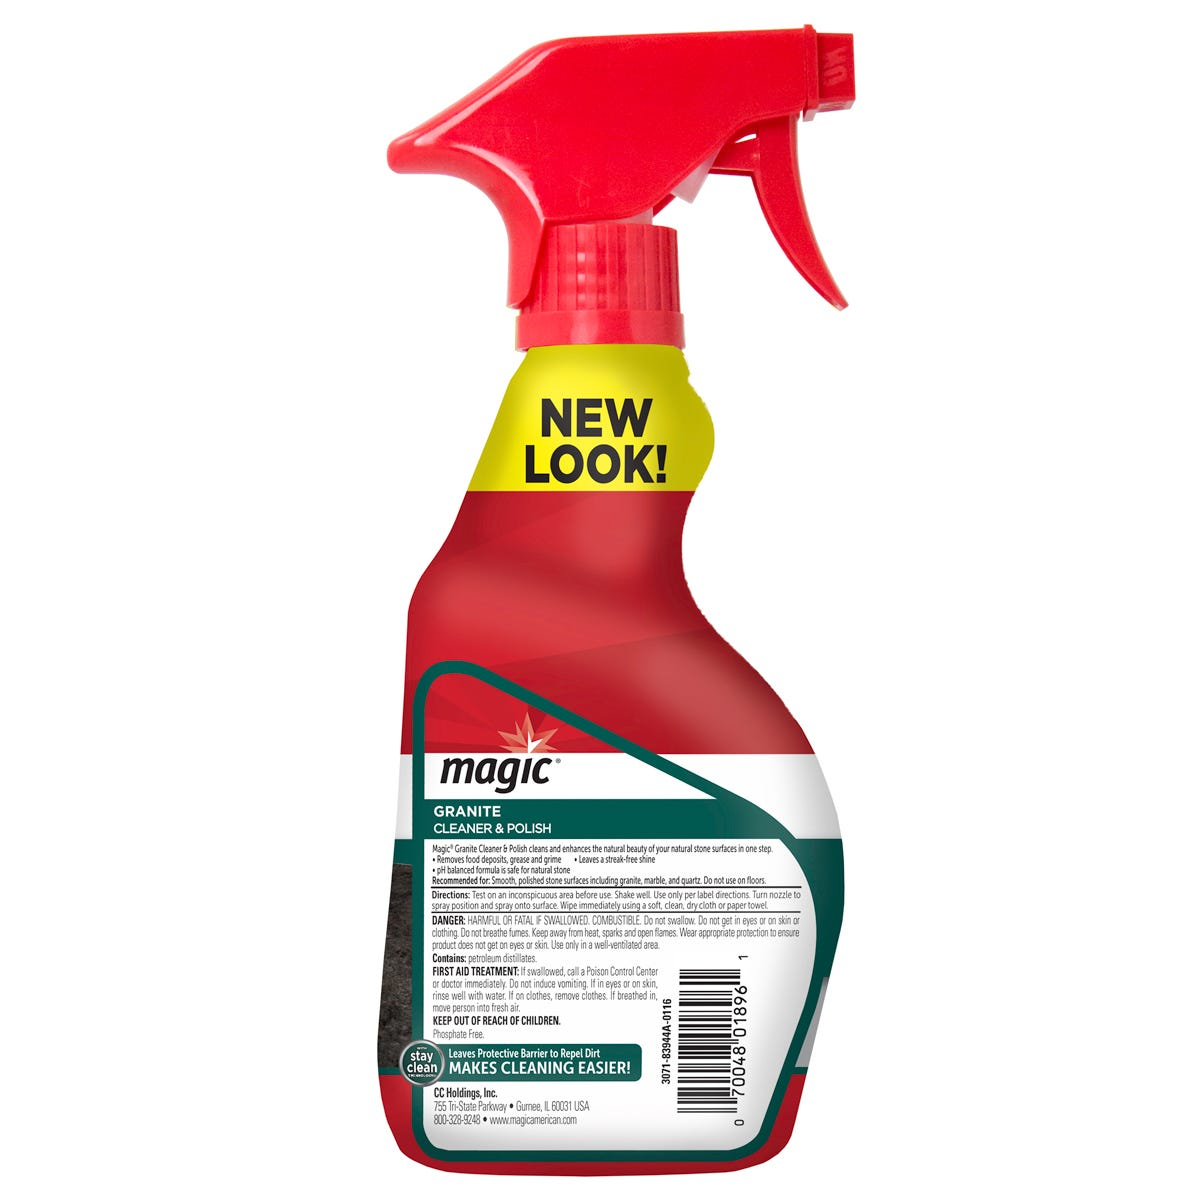 Magic Granite Cleaner Spray back label